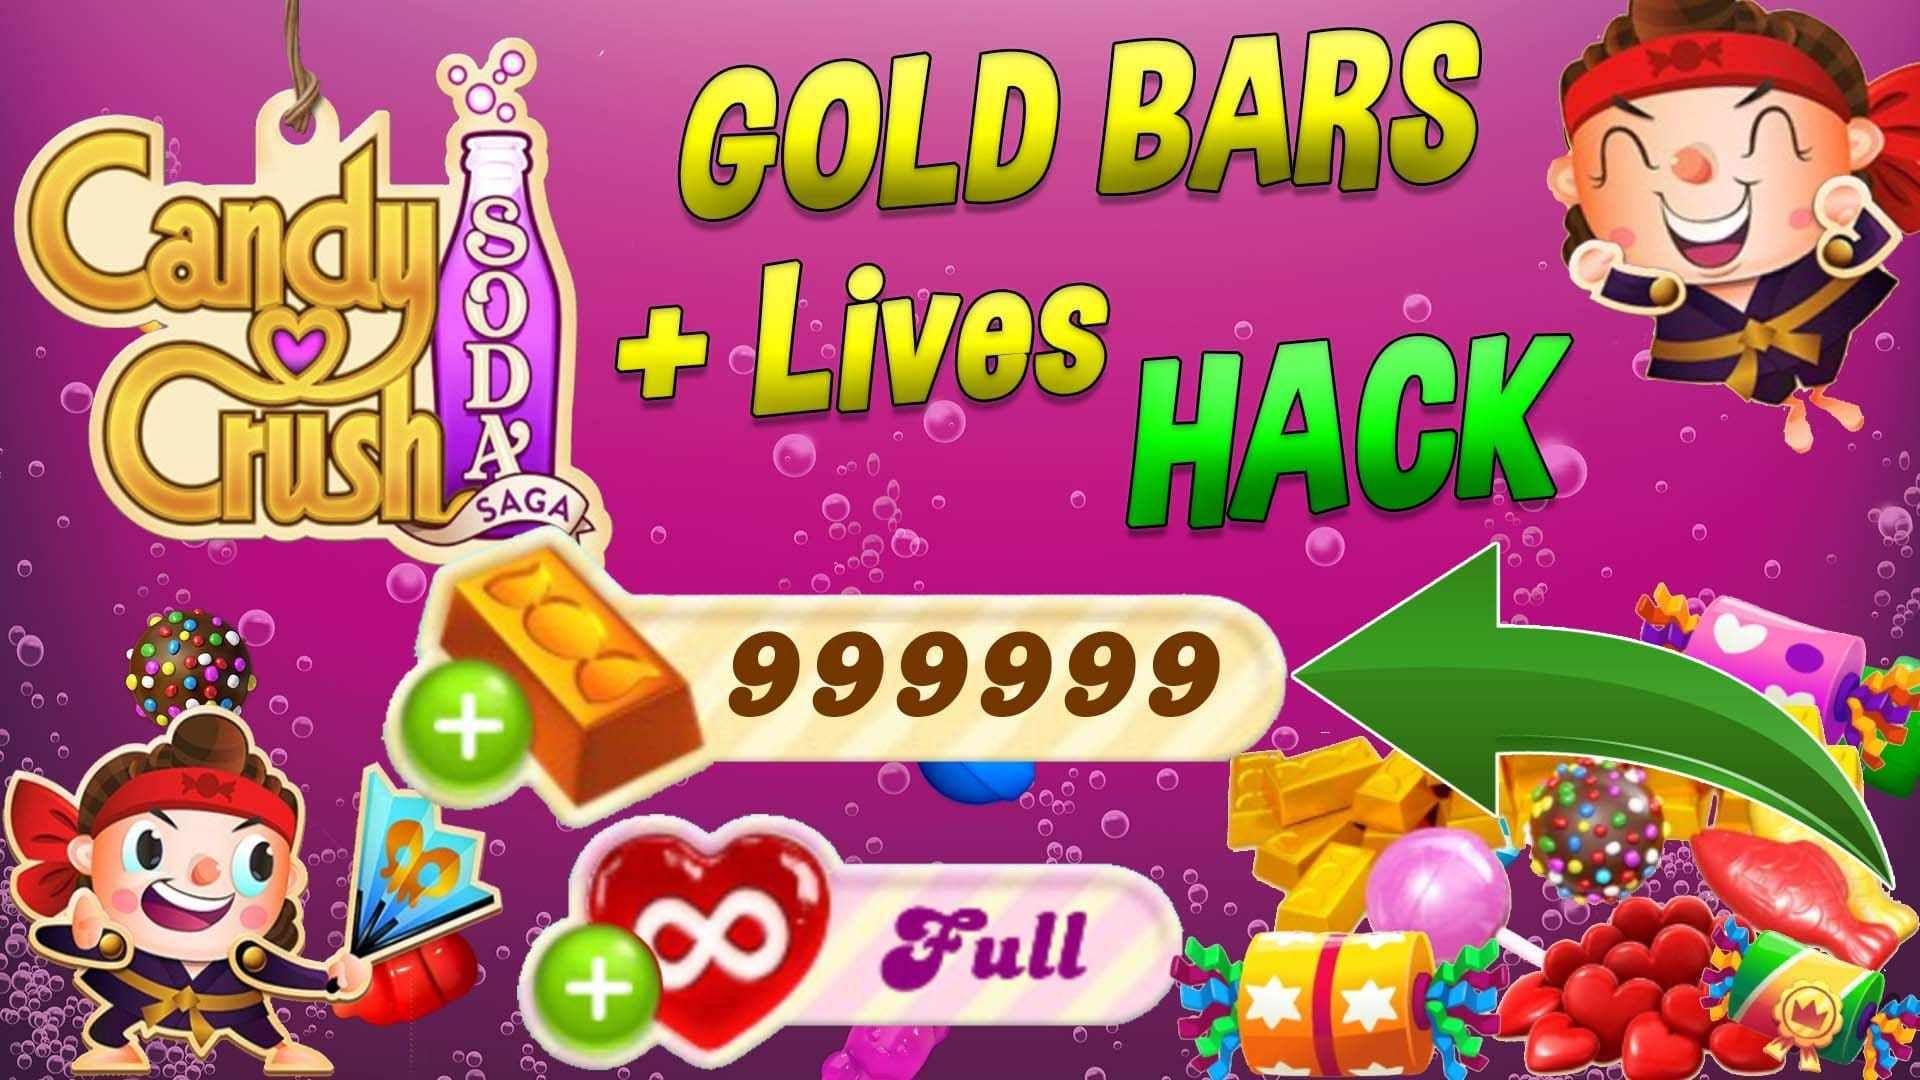 Candy Crush Jelly Saga Hack Tool